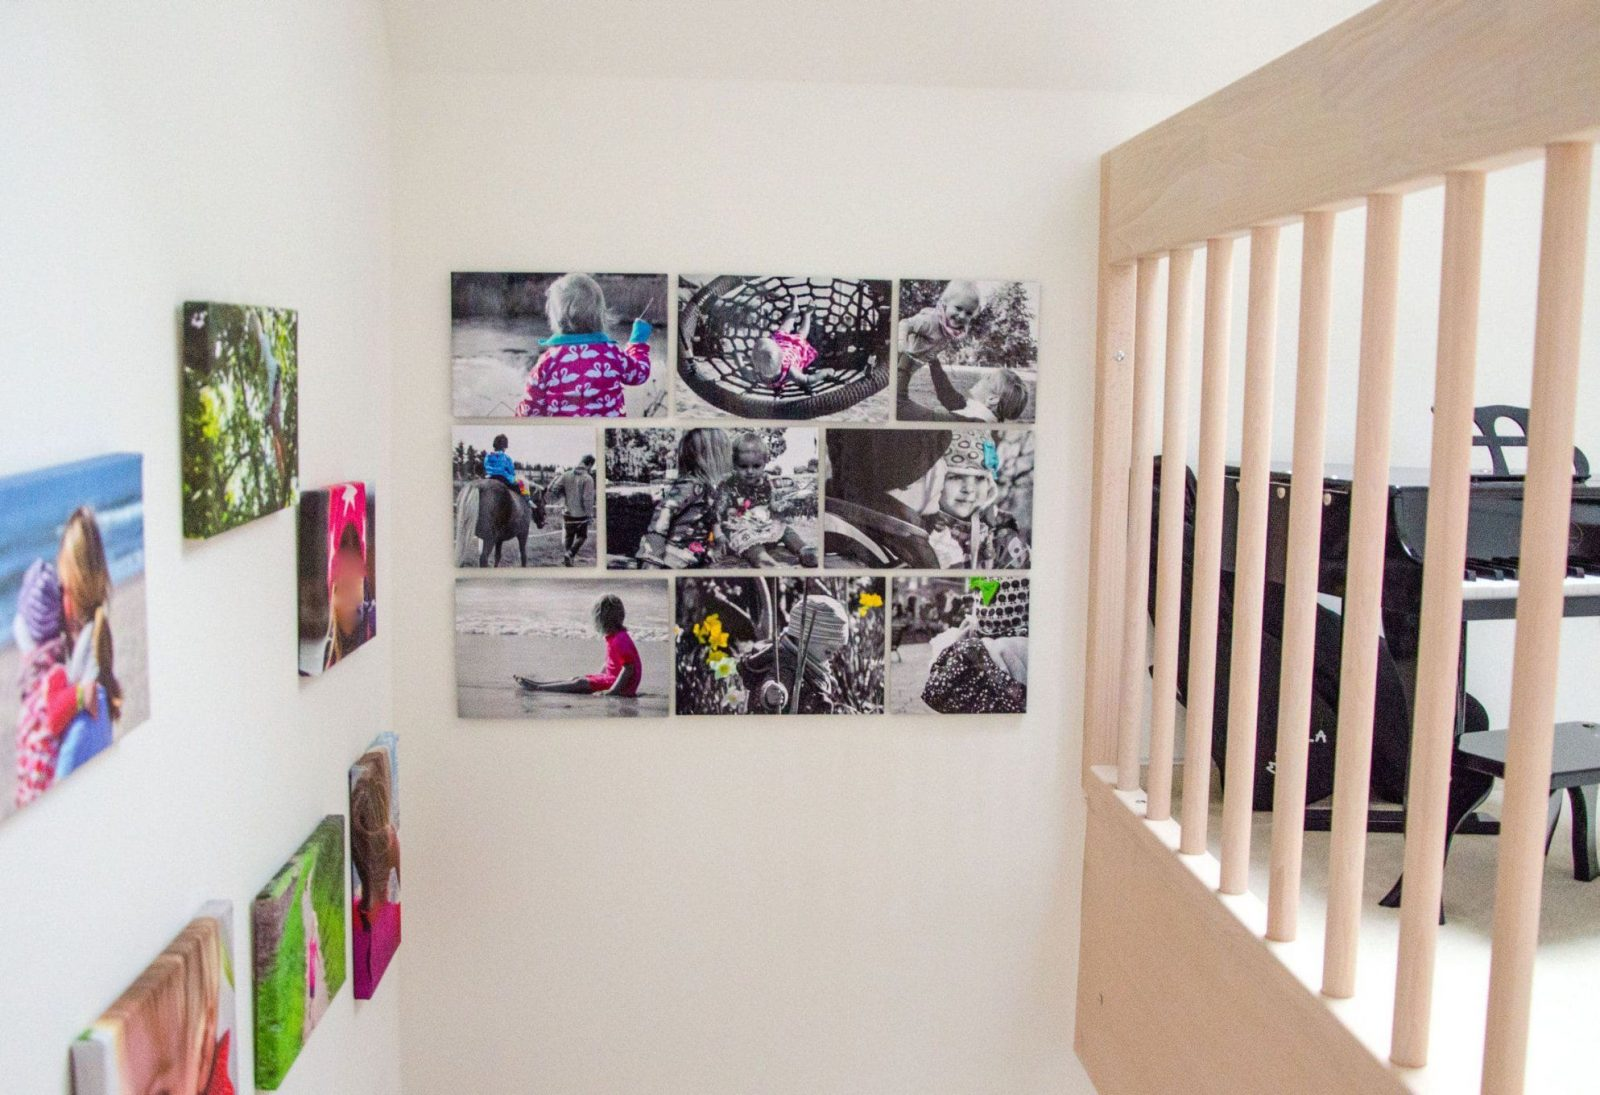 Fotowand Gestalten Ohne Bilderrahmen | Haus Design Ideen